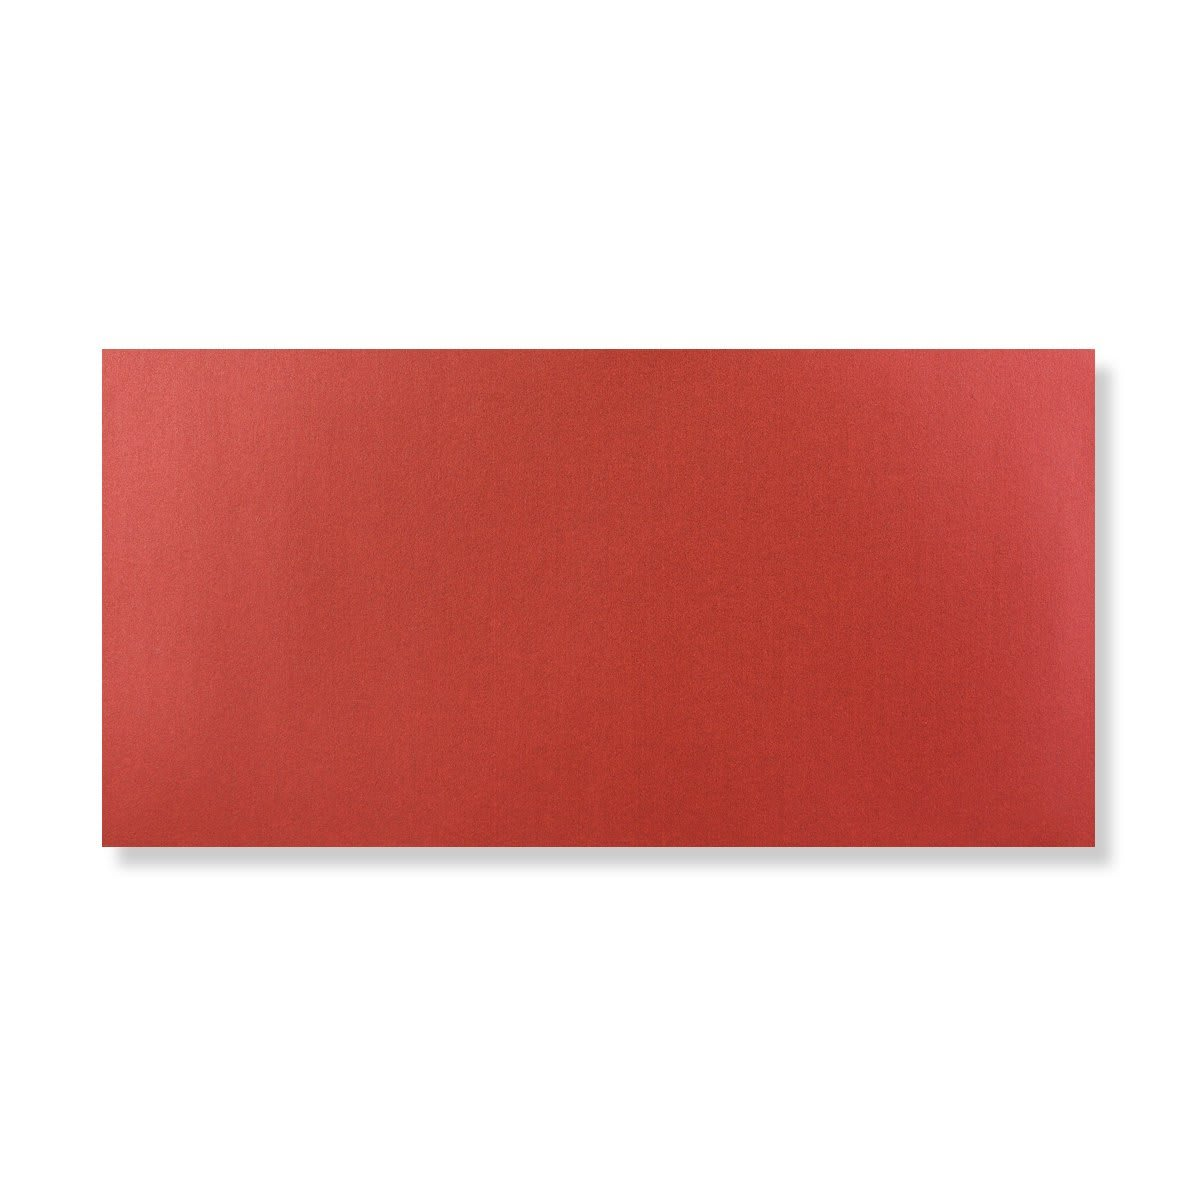 DL CARDINAL RED PEARLESCENT ENVELOPES